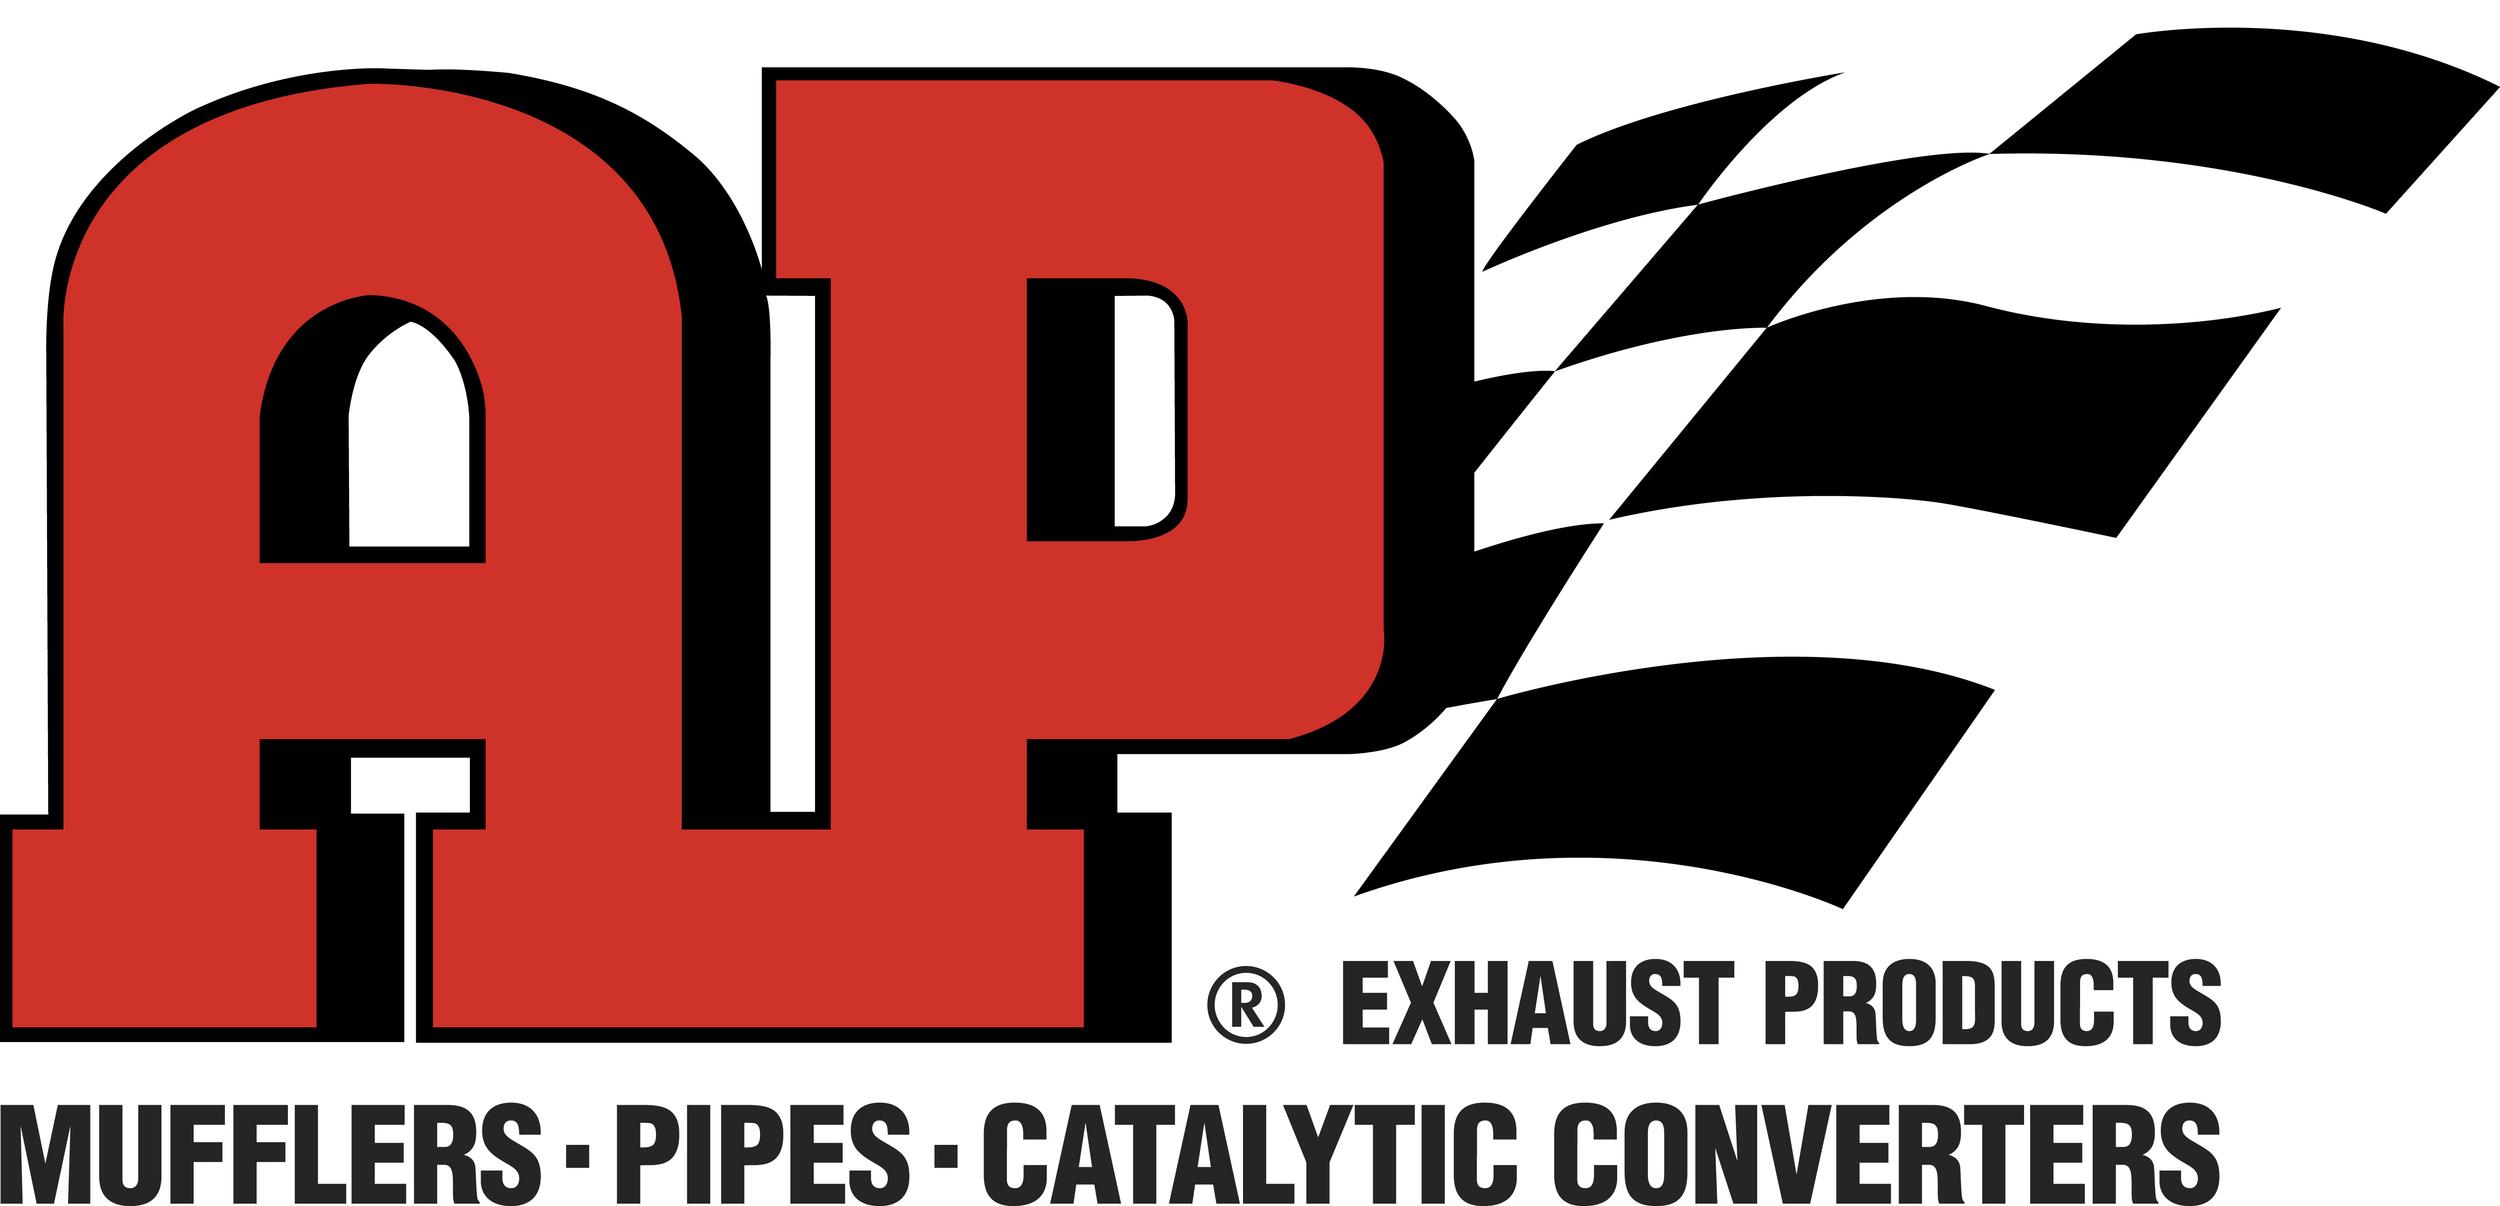 AP-PipesETC-1otln.jpg